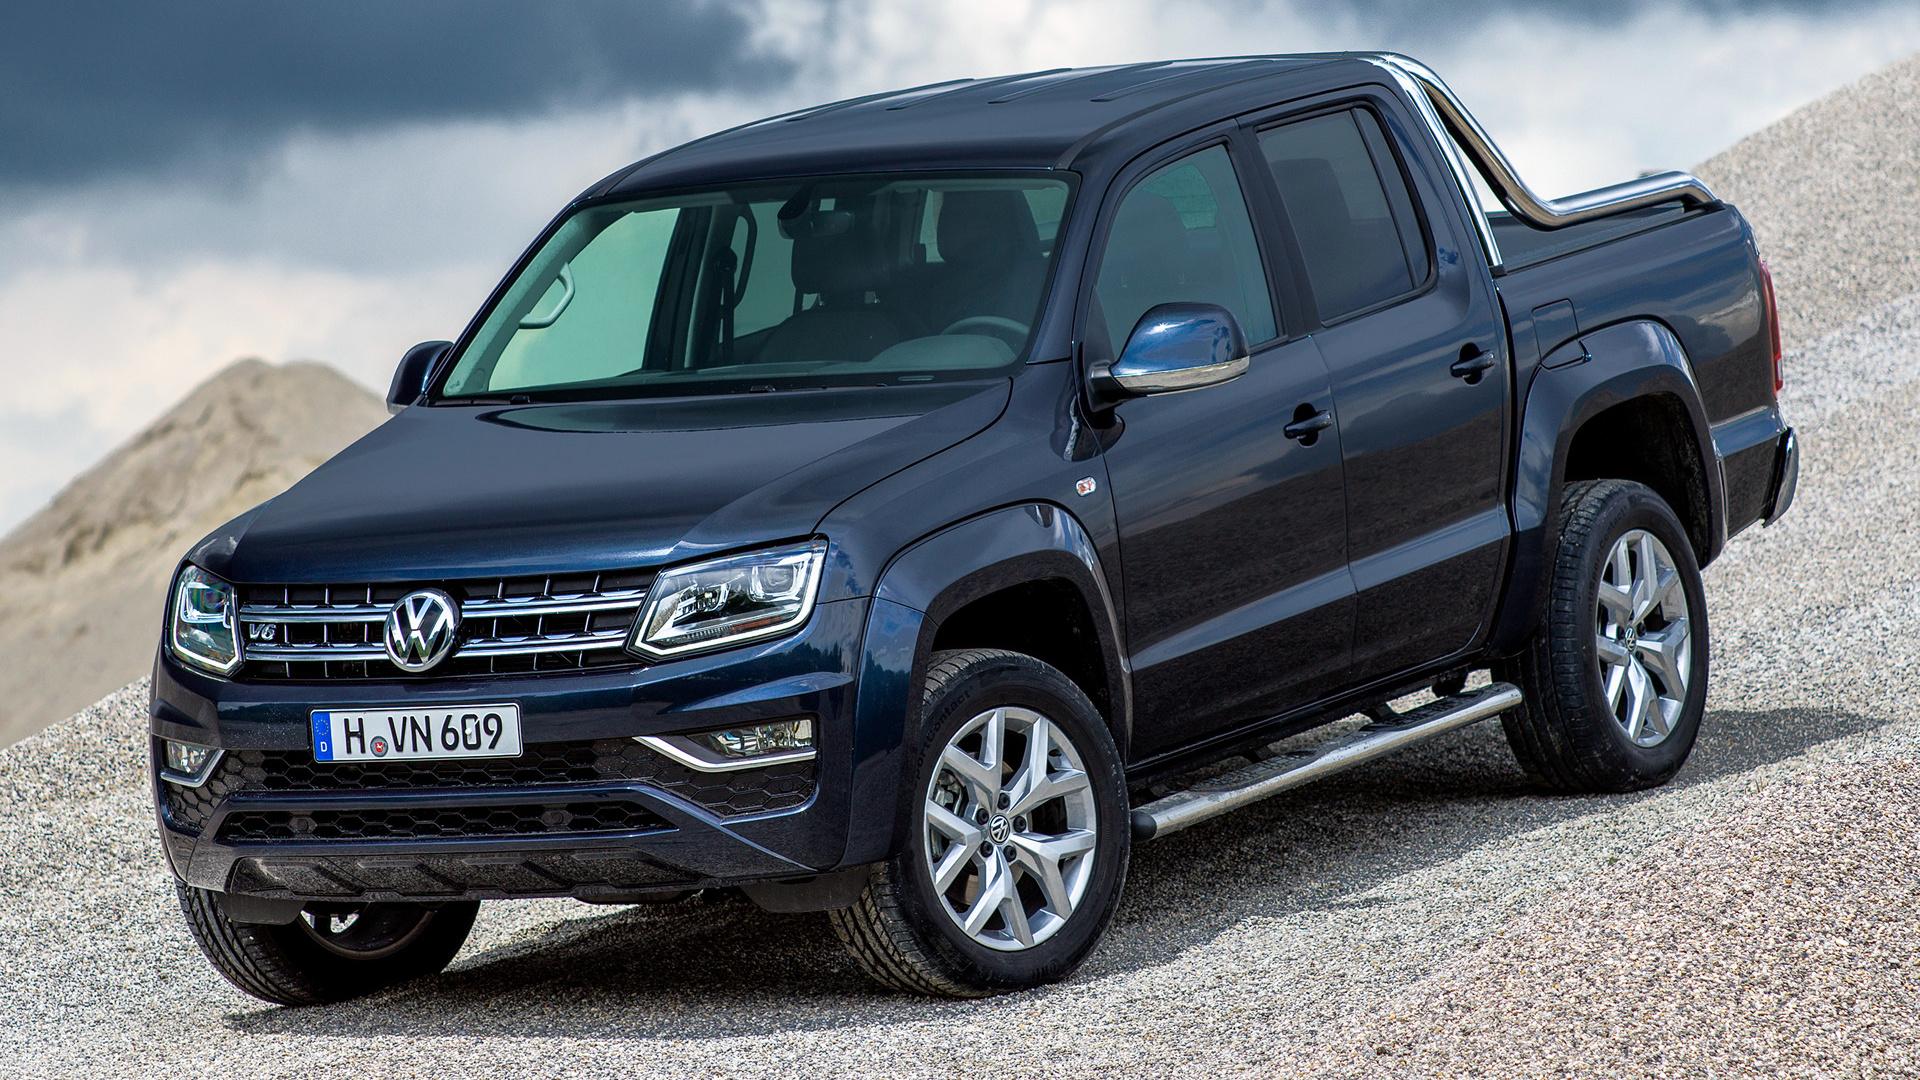 Volkswagen Amarok Double Cab 2016 Wallpapers And Hd